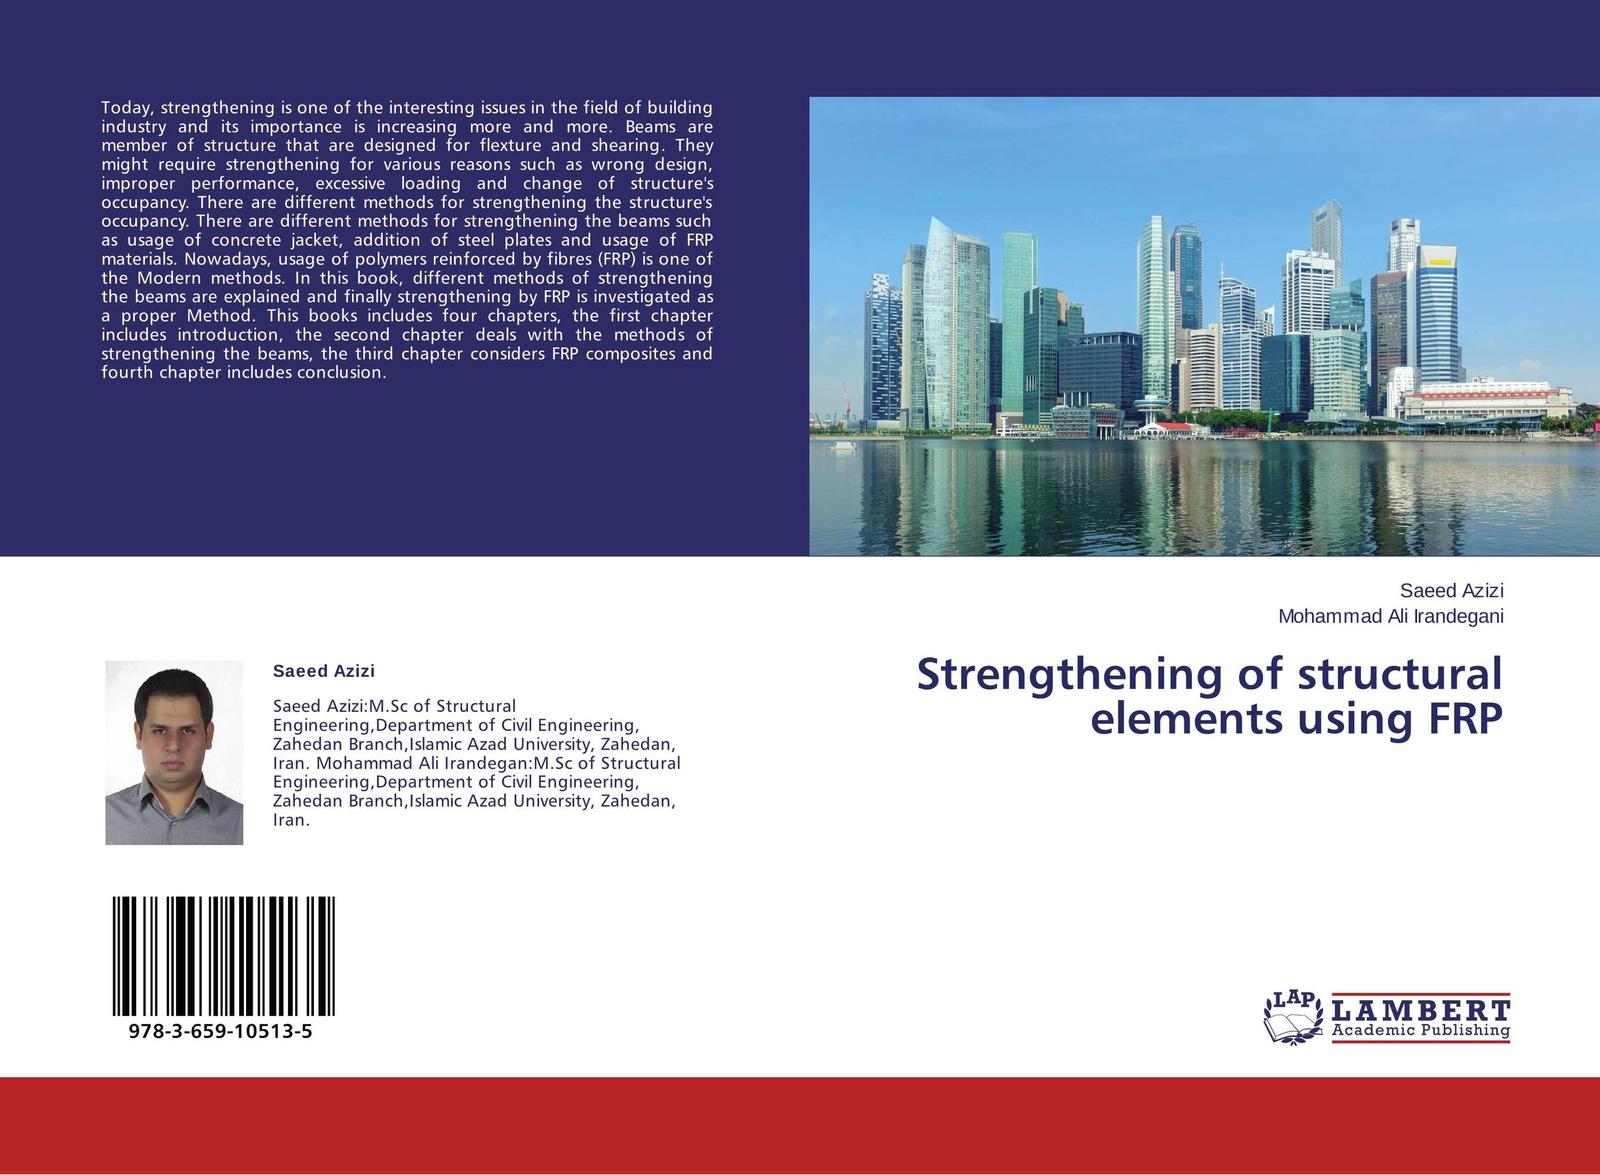 Saeed Azizi and Mohammad Ali Irandegani Strengthening of structural elements using FRP